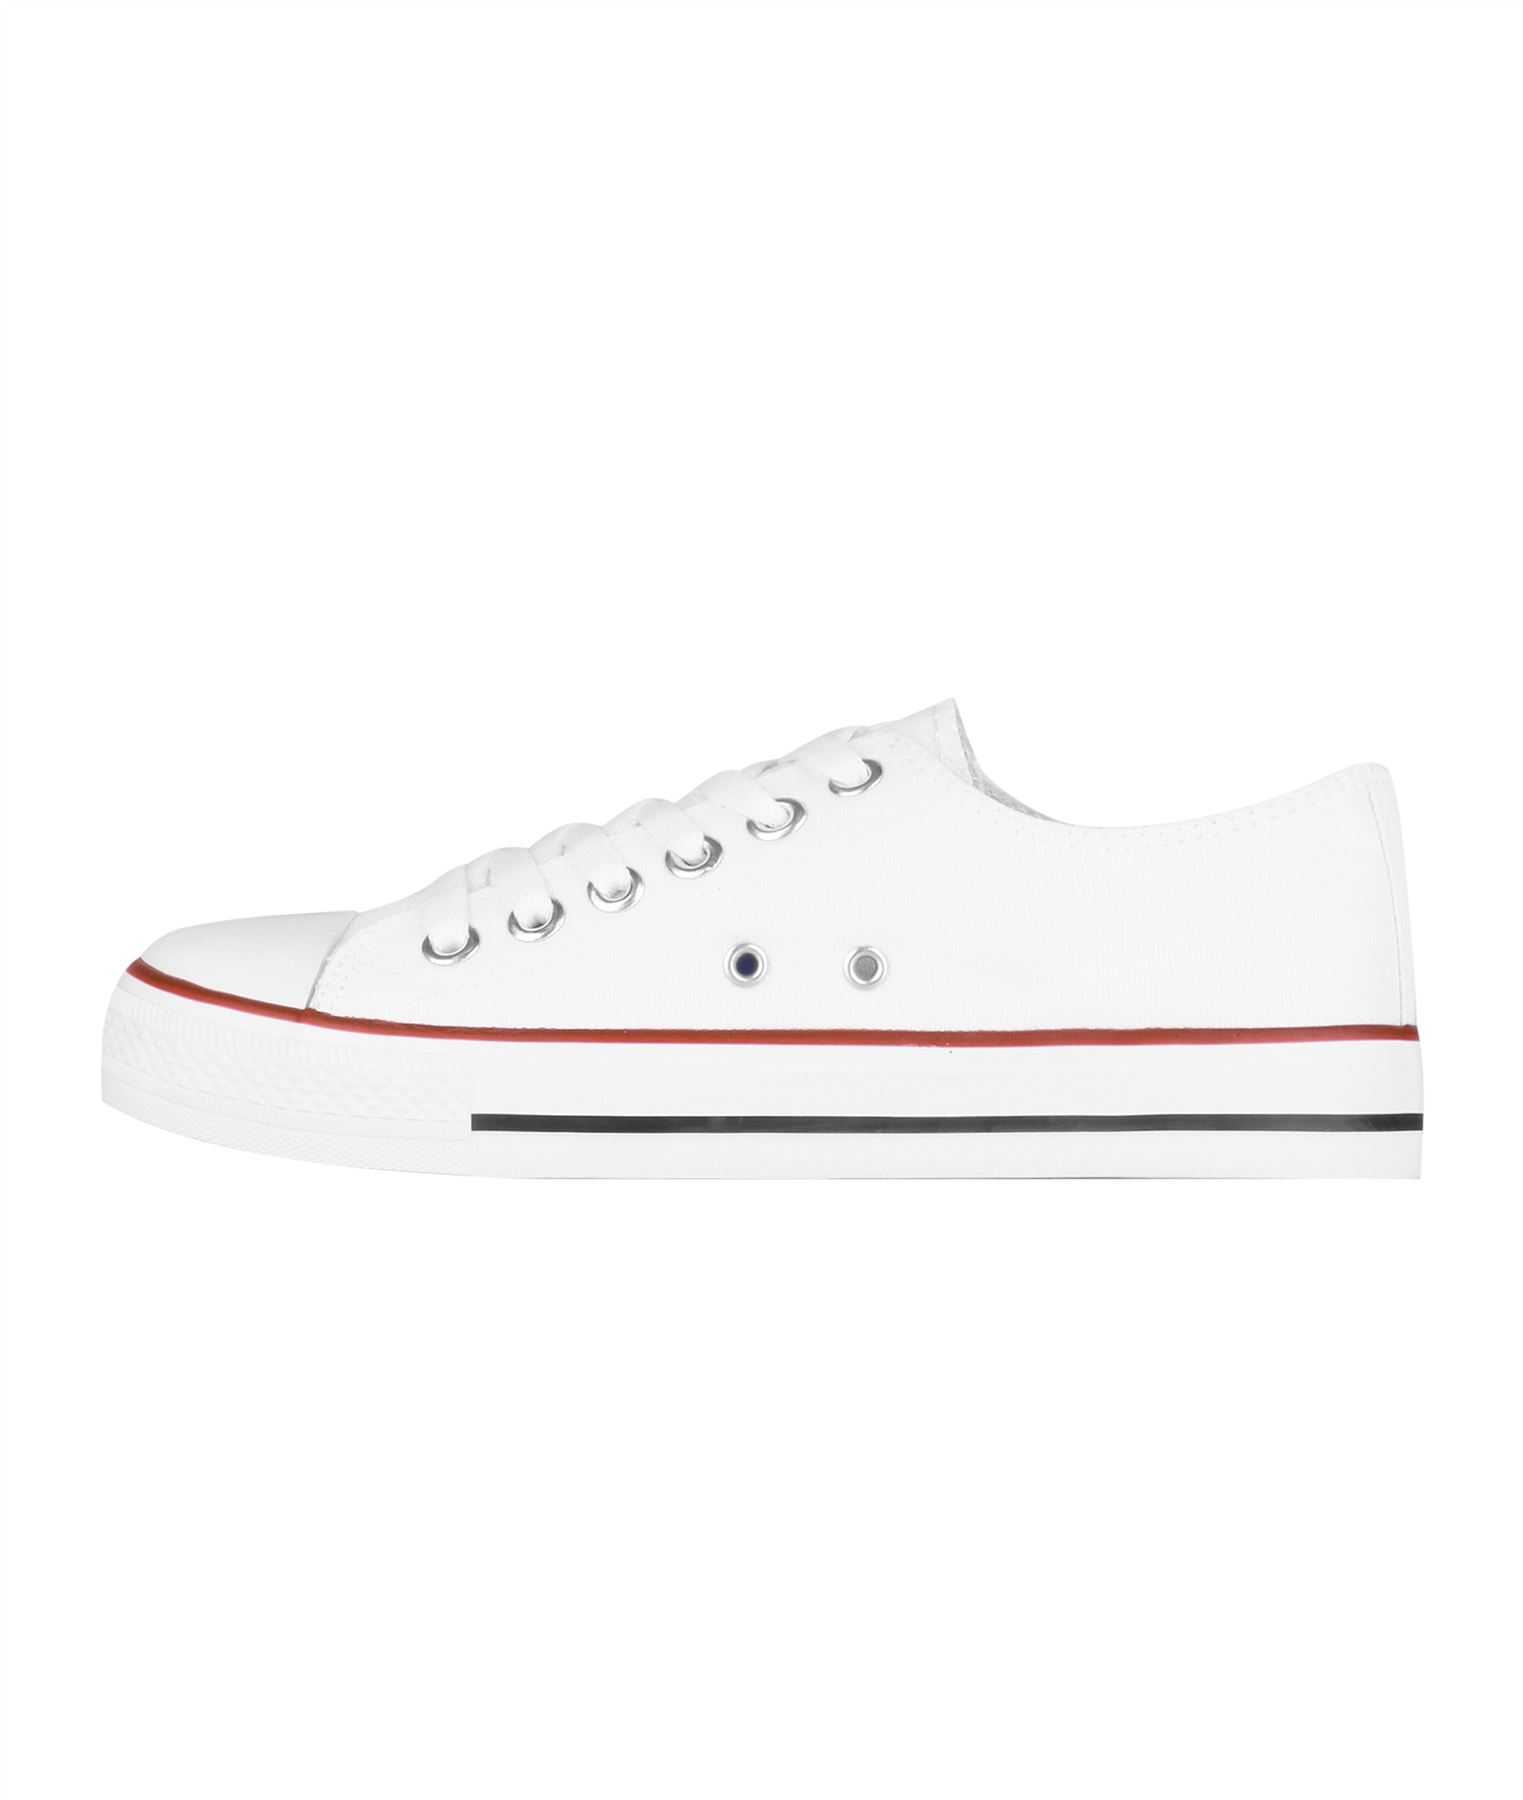 Zapatillas-Mujer-Casuales-Deportiva-Barata-Lona-Moda-Originales-Outlet-Tela-Moda miniatura 11